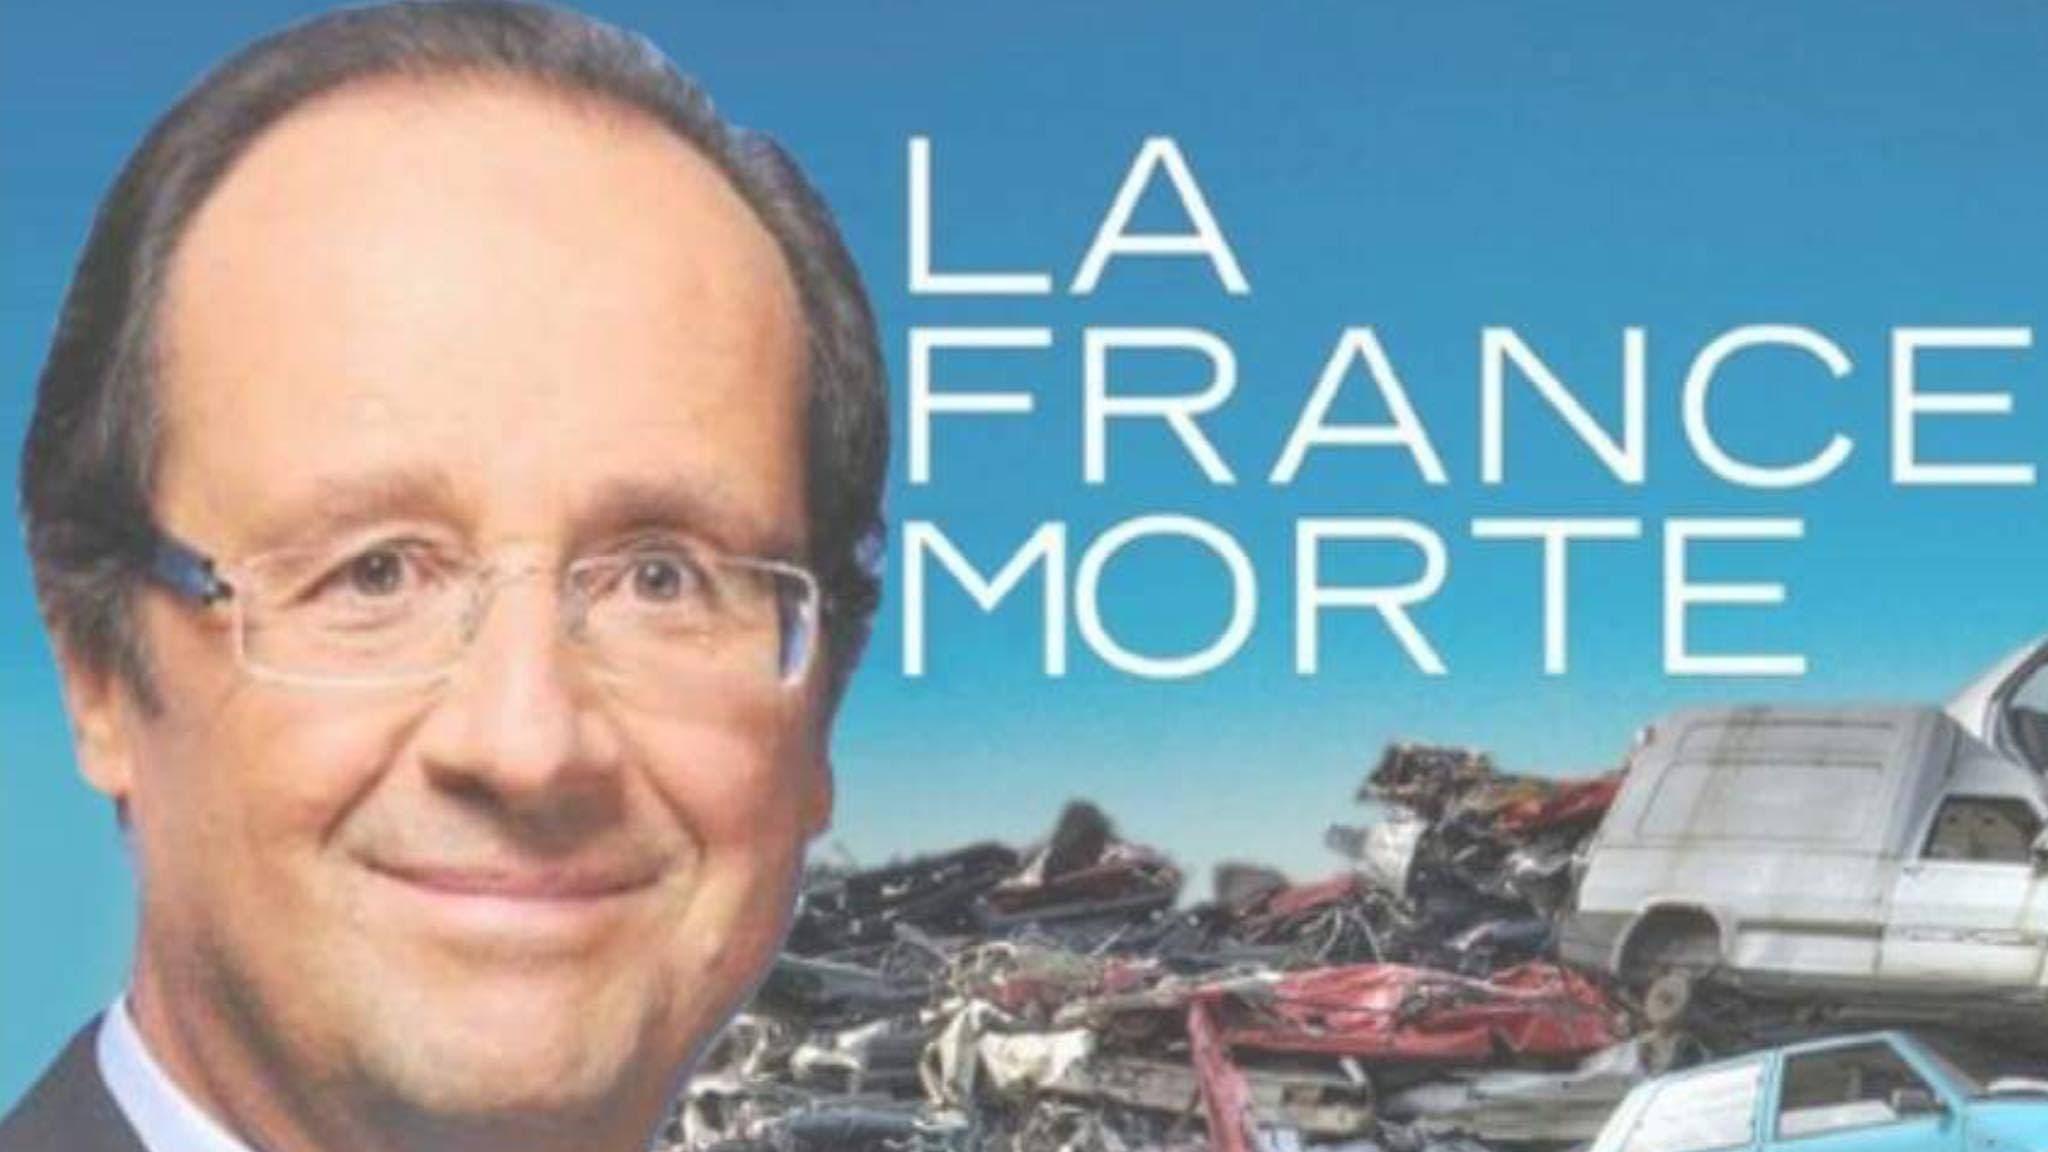 france-morte